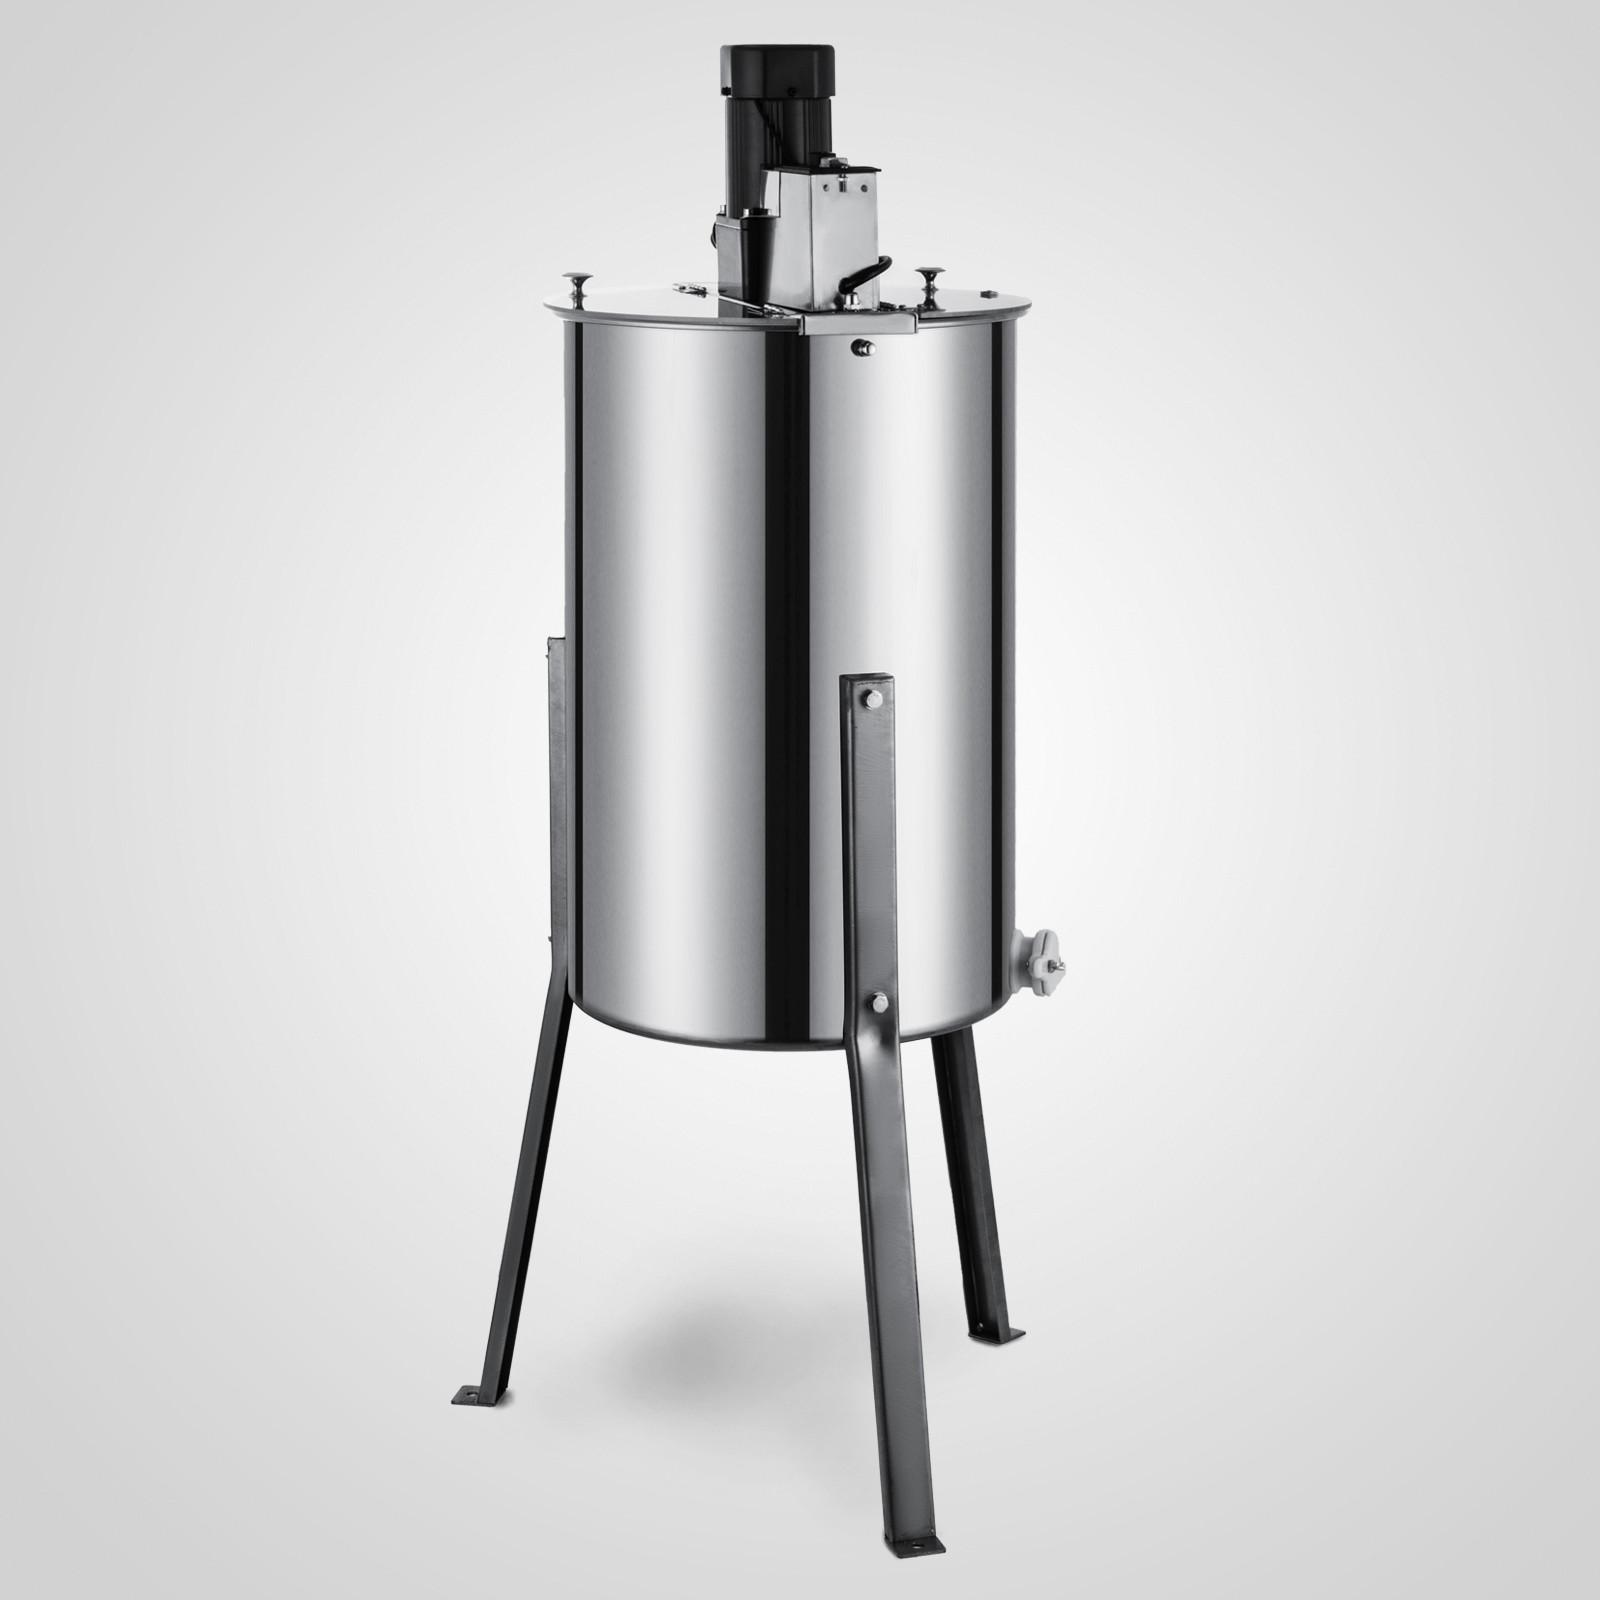 Extracteur-de-Miel-Electrique-manuelle-2-3-4-Cadres-En-Acier-Inox-Centrifugeuse miniature 40